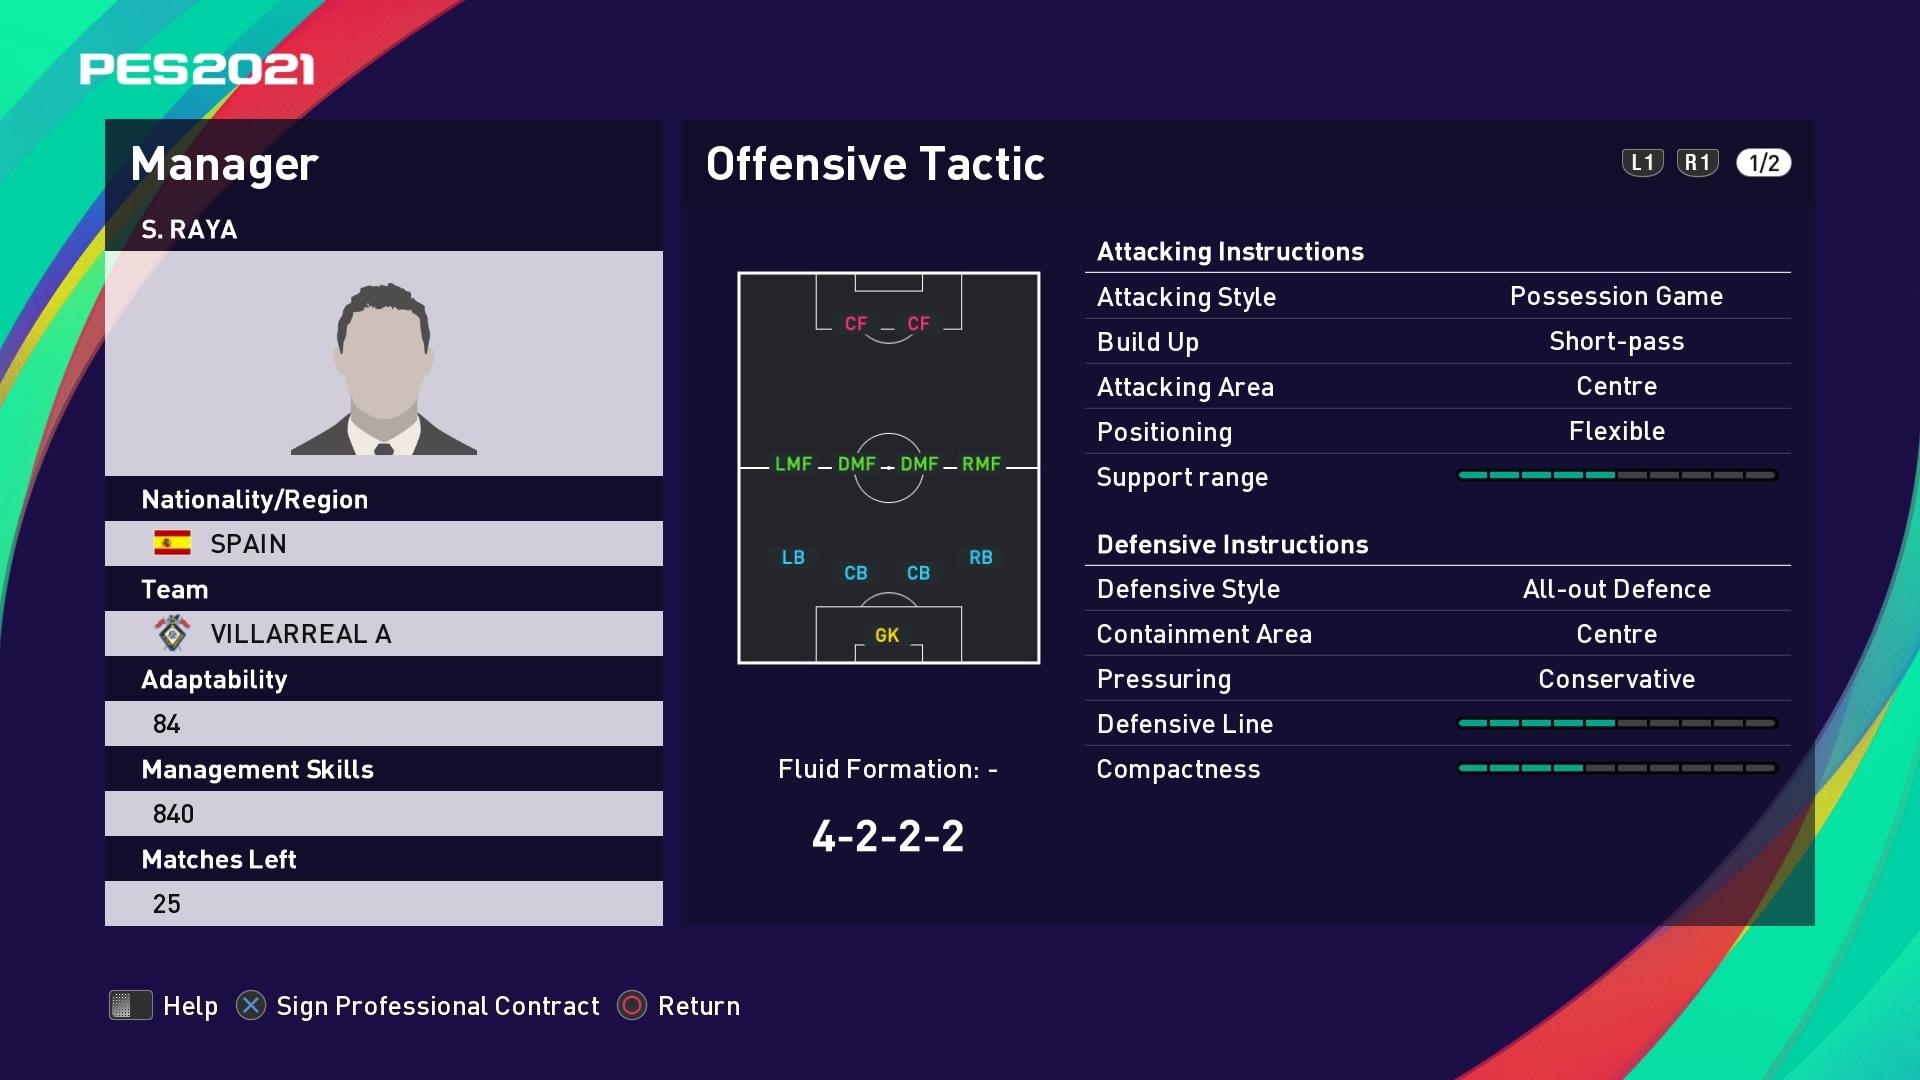 S. Raya (Unai Emery) Offensive Tactic in PES 2021 myClub